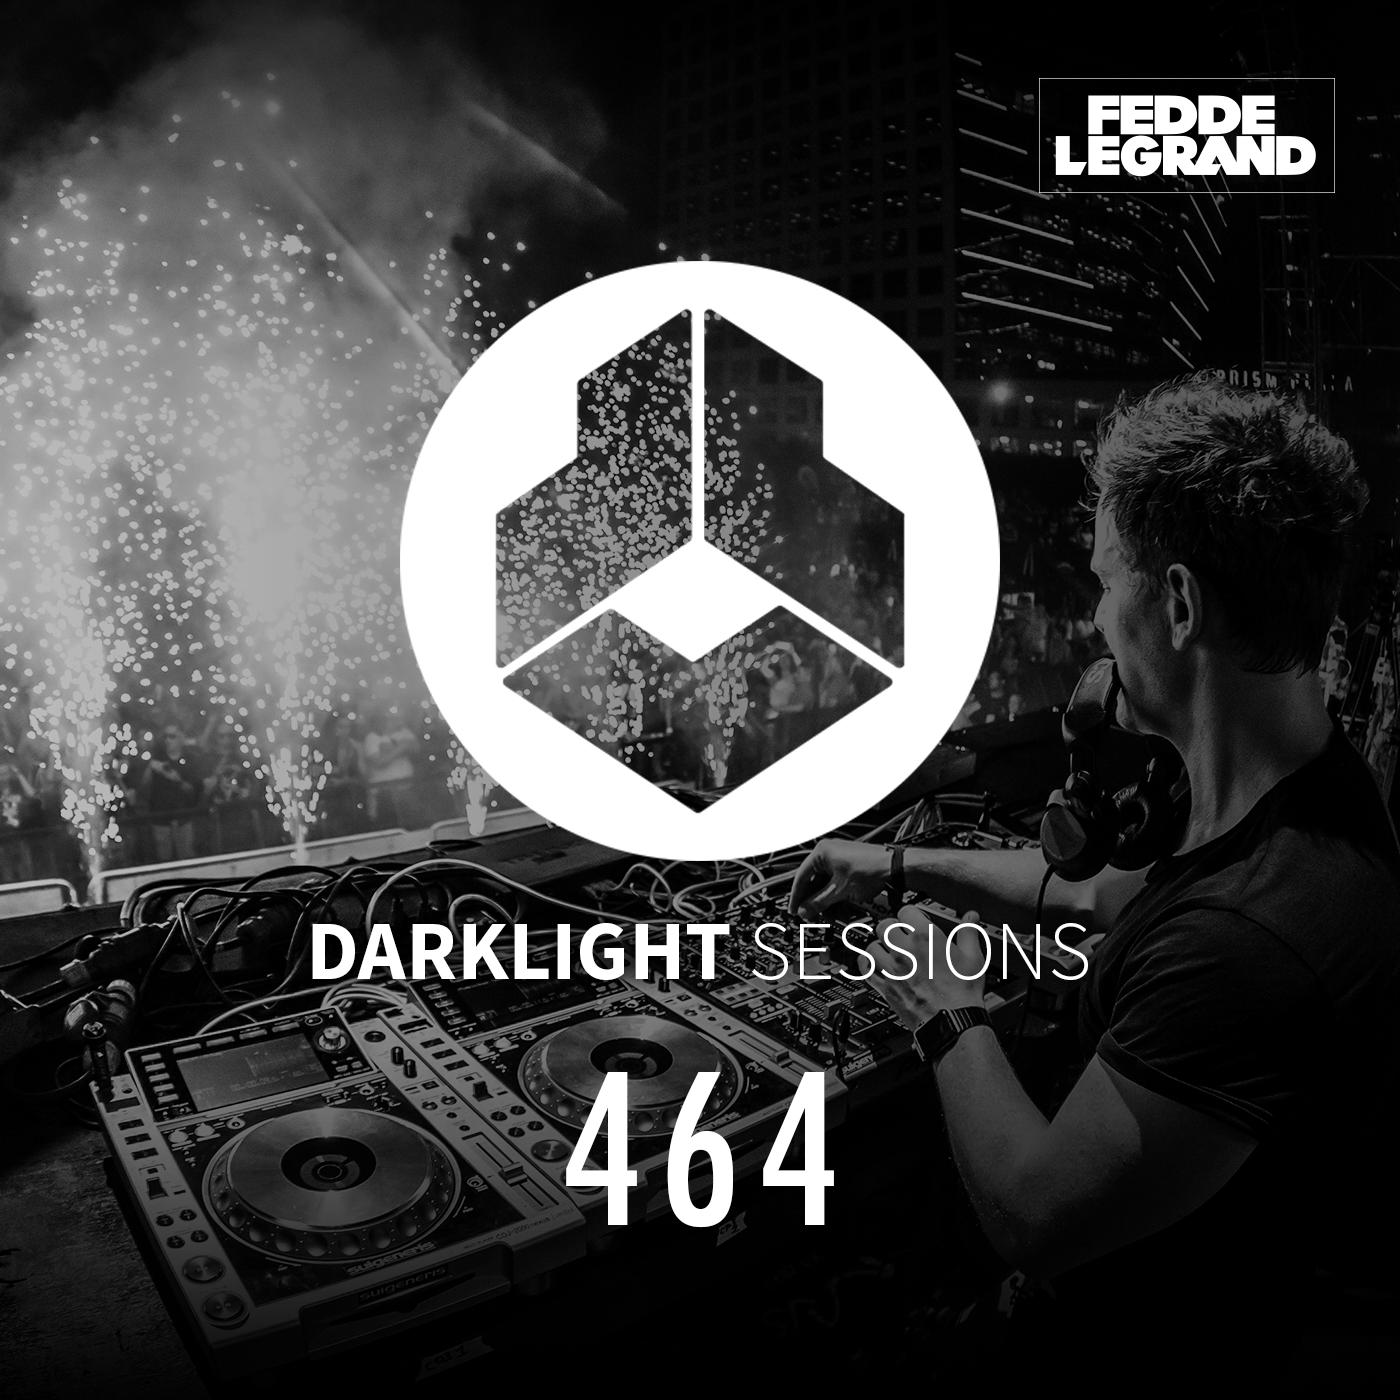 Darklight Sessions 464